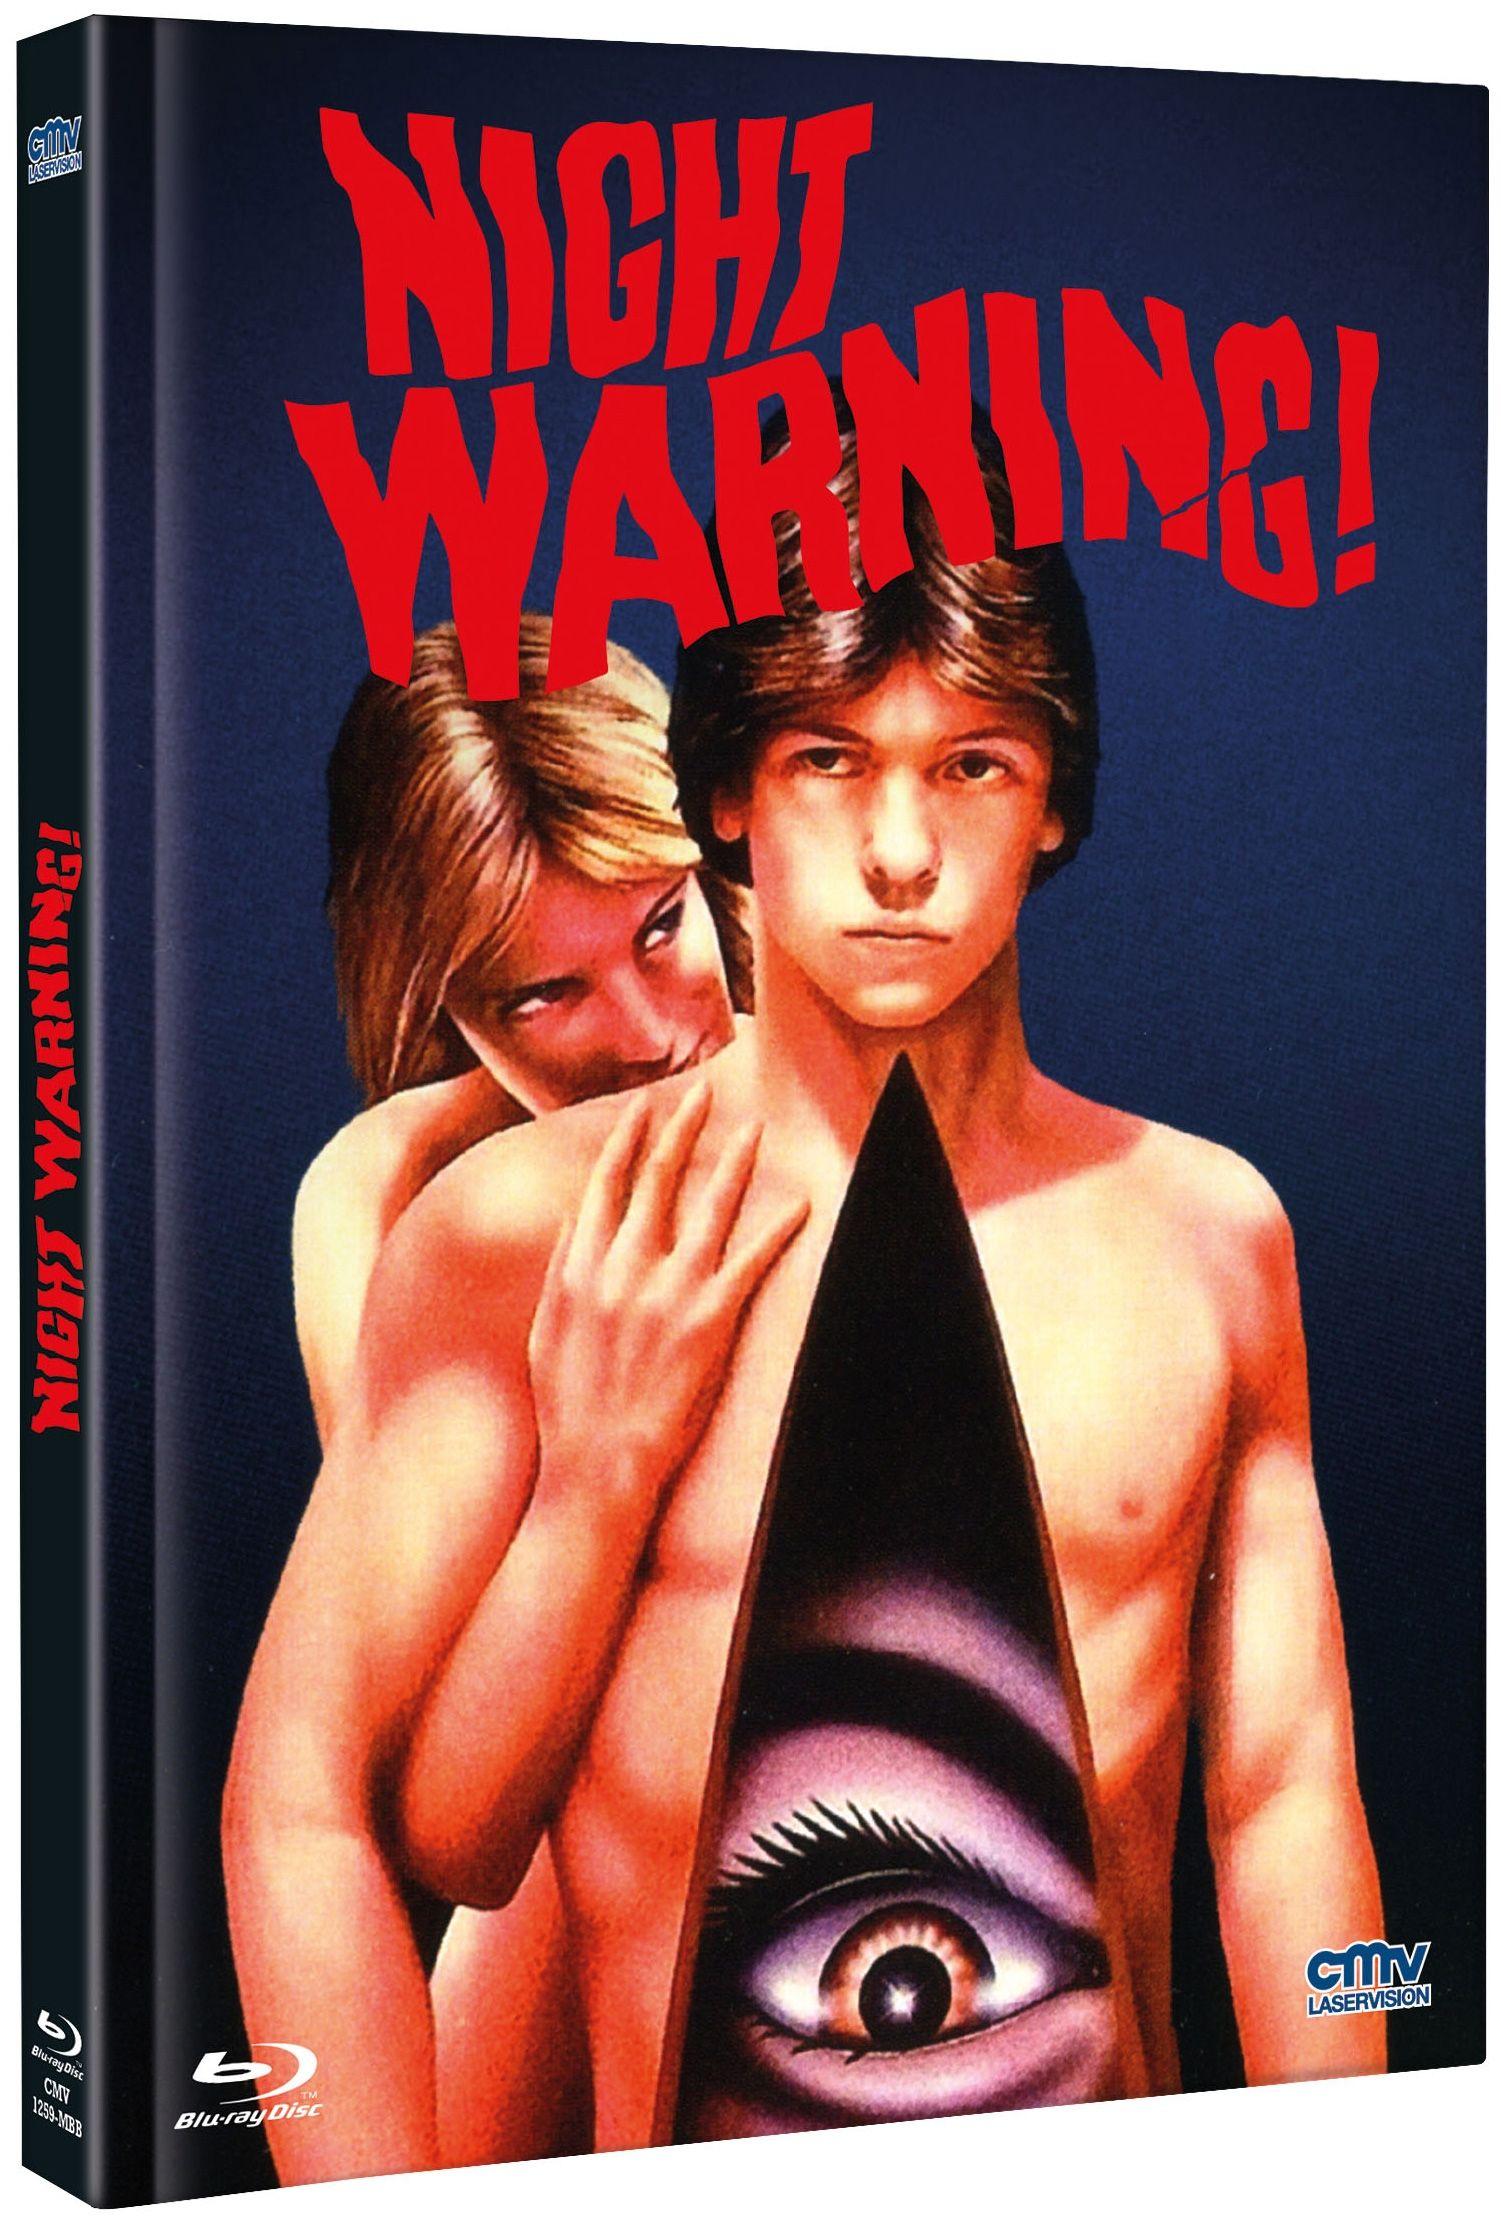 Night Warning (Lim. Uncut Mediabook - Cover B) (DVD + BLURAY)